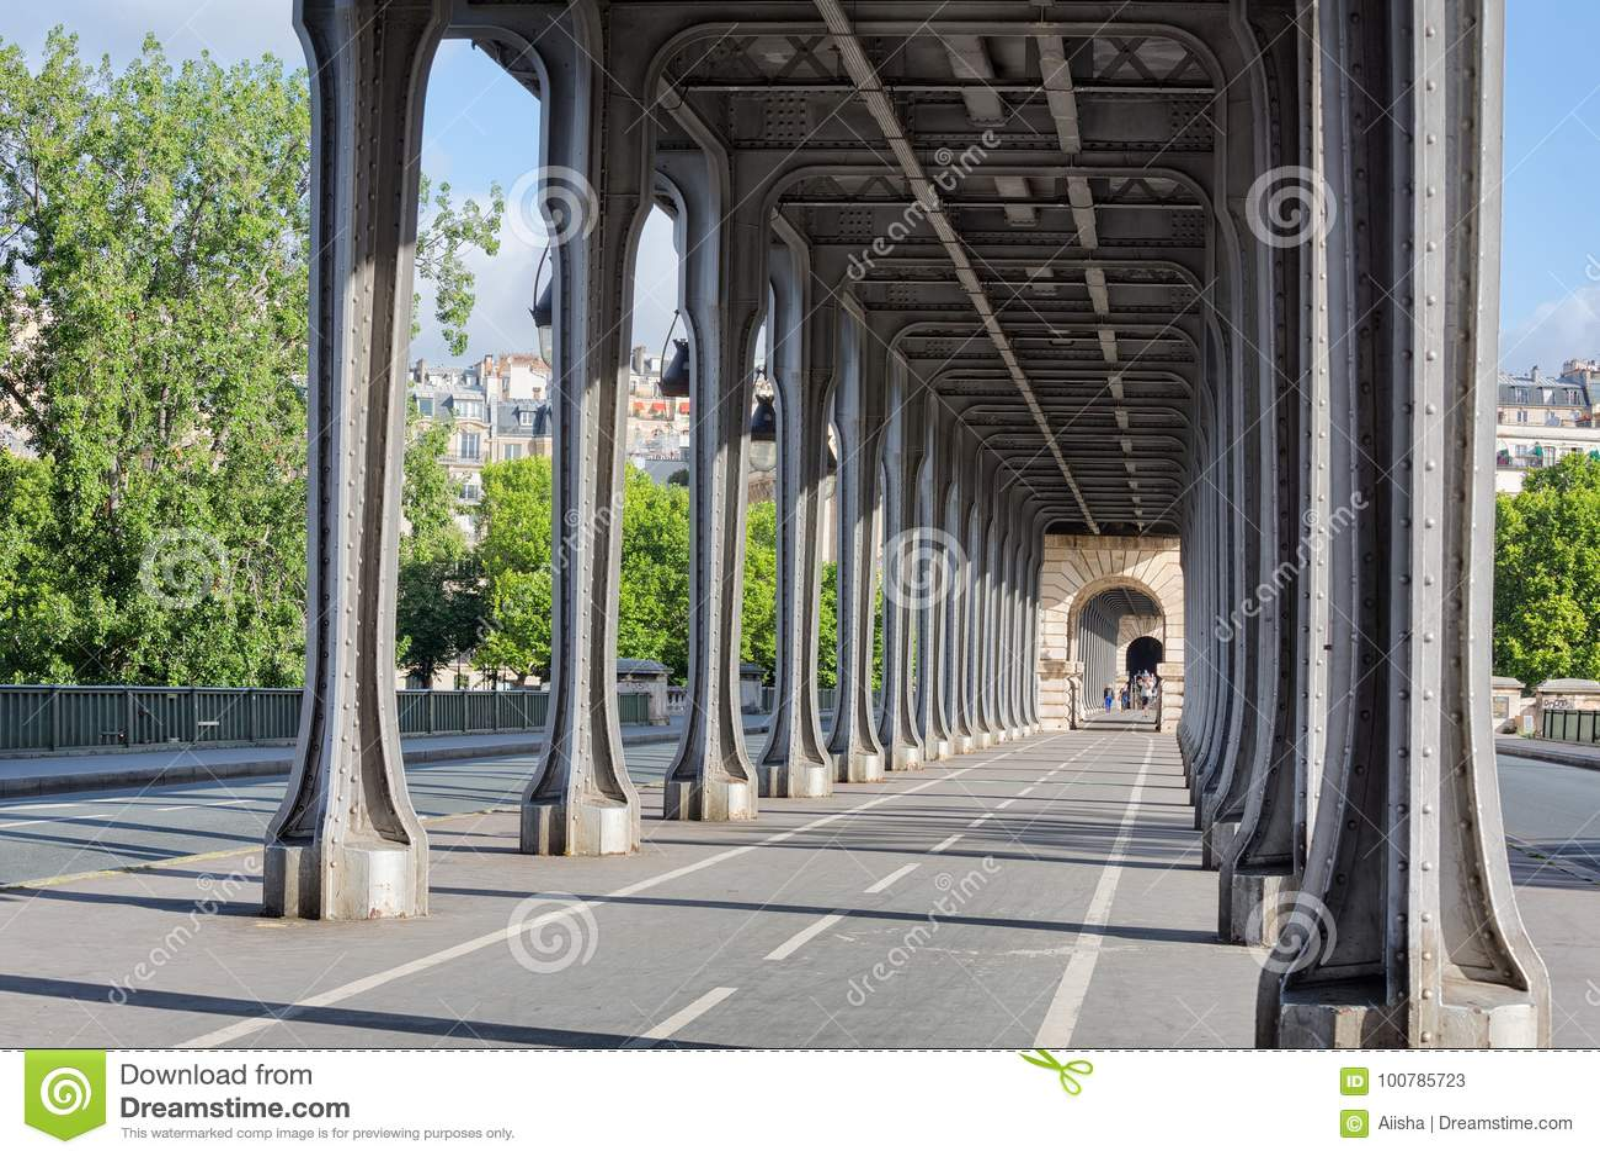 Pont De Bir Hakeim Editorial Stock Photo Image Of Building